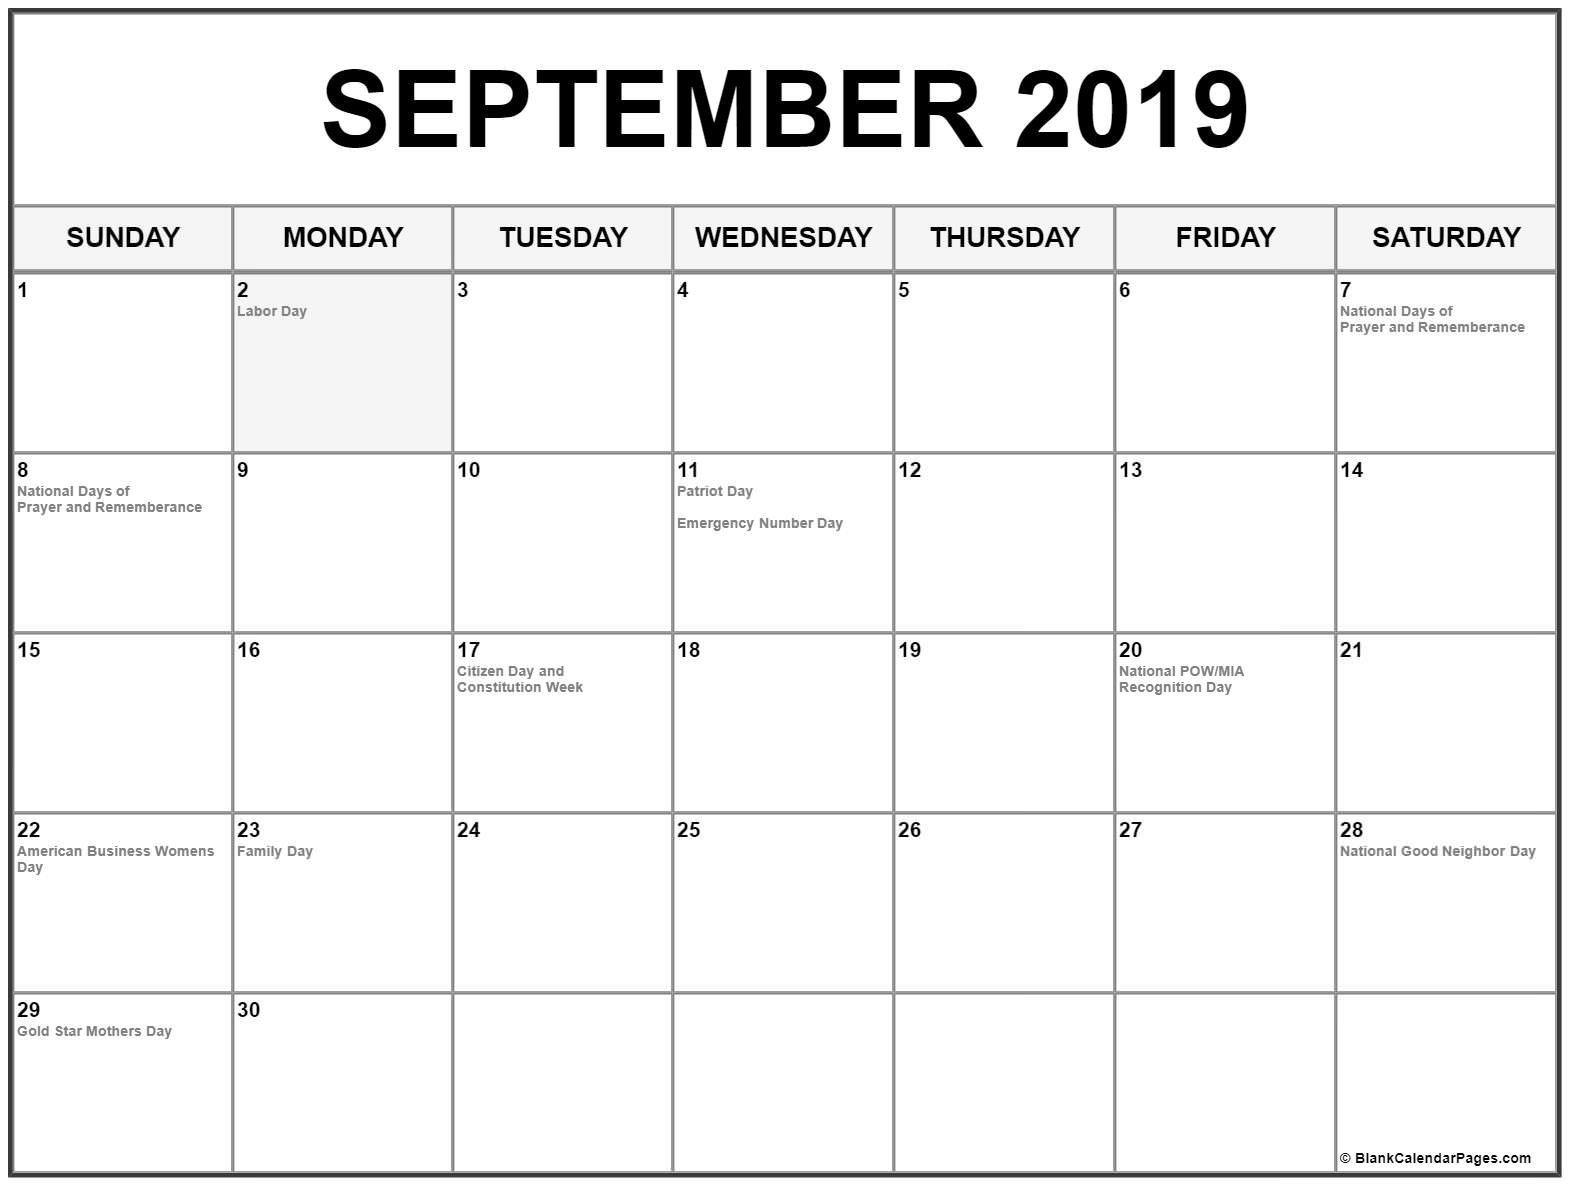 September 2019 Calendar With Holidays #september #september2019 Calendar 2019 Sept